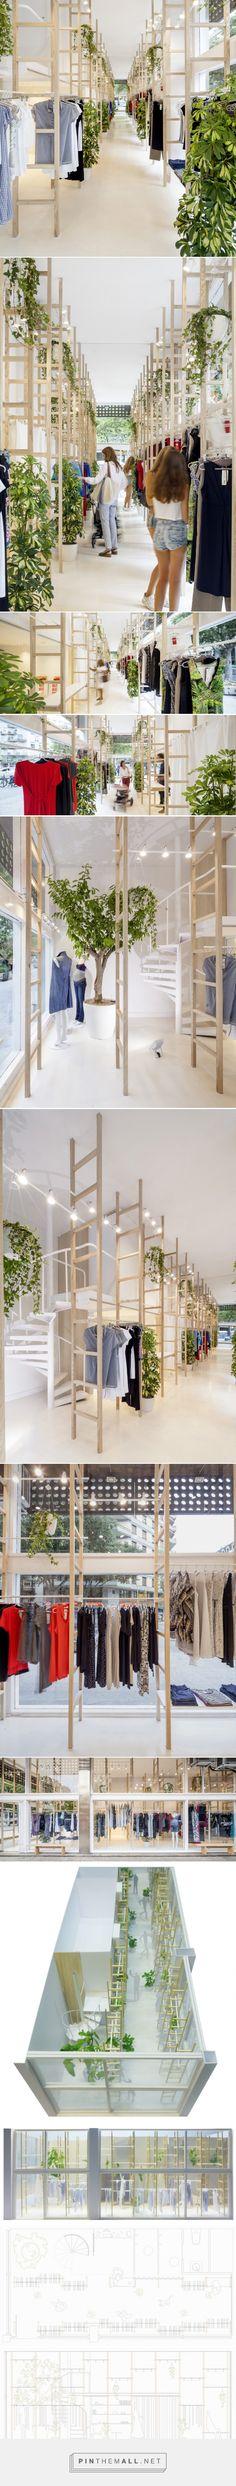 román izquierdo designs minimal, light-filled mit mat mama store in barcelona - created via https://pinthemall.net